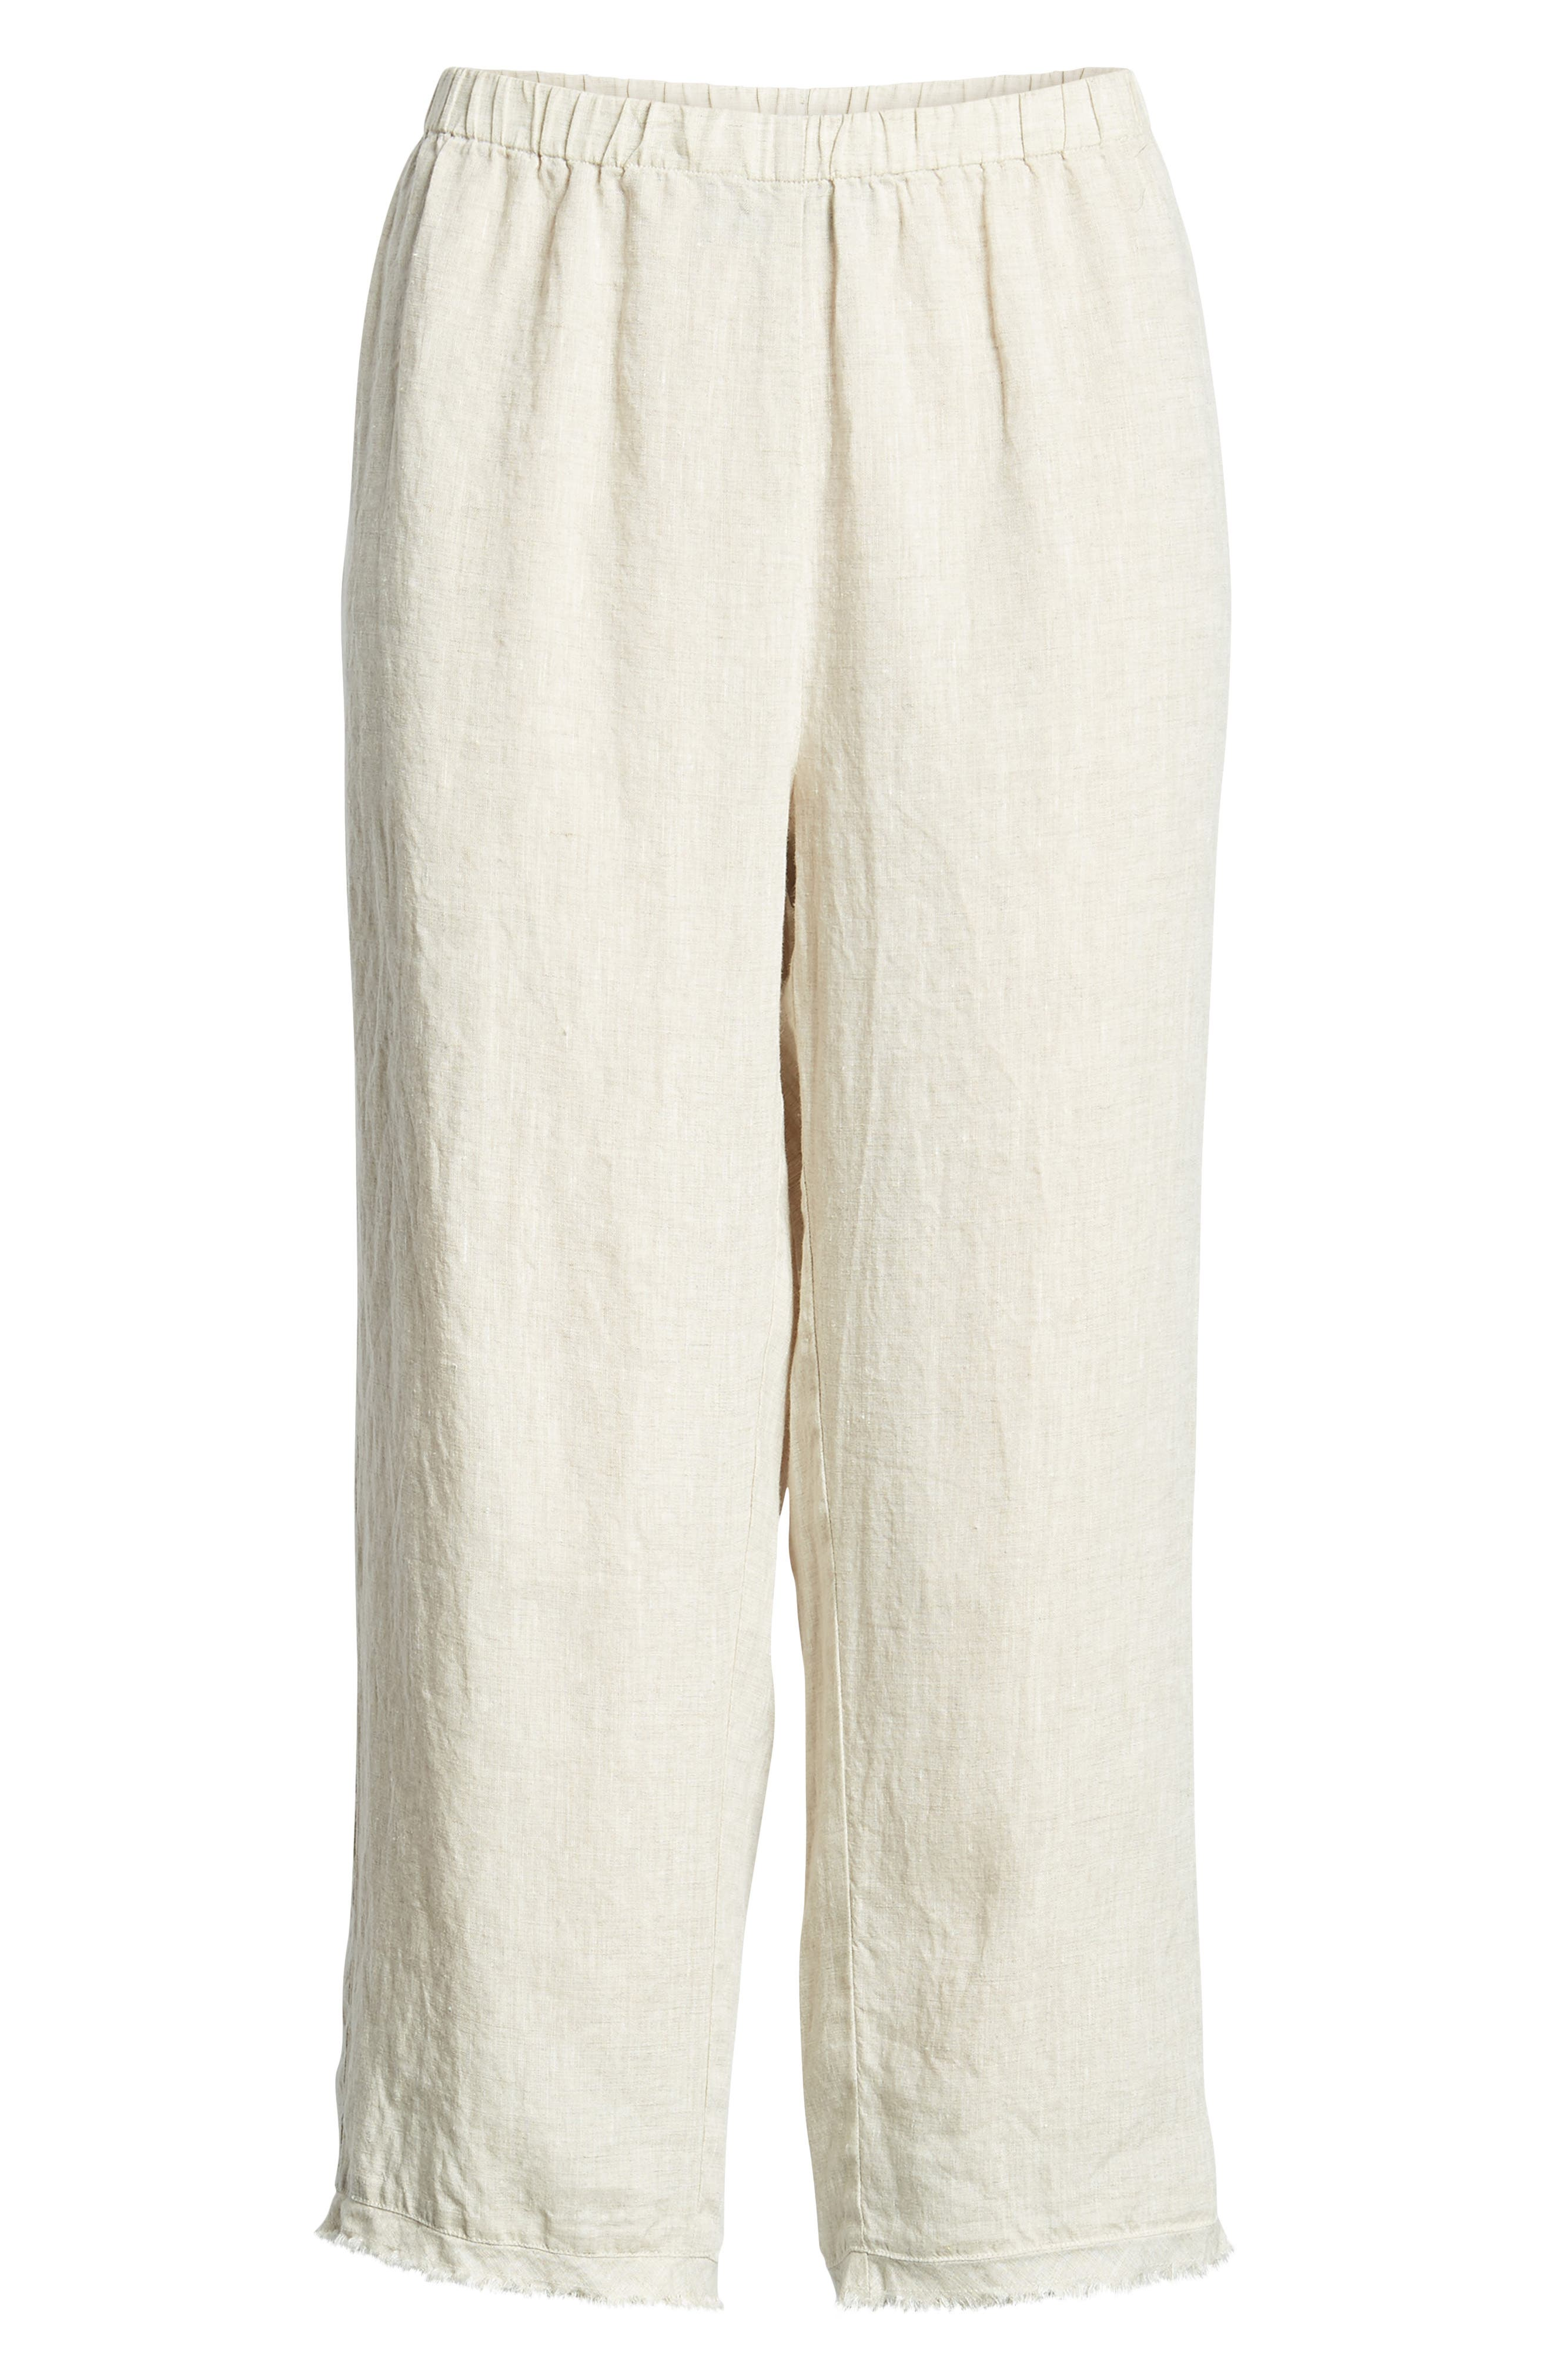 Crop Straight Leg Linen Pants,                             Alternate thumbnail 7, color,                             Natural